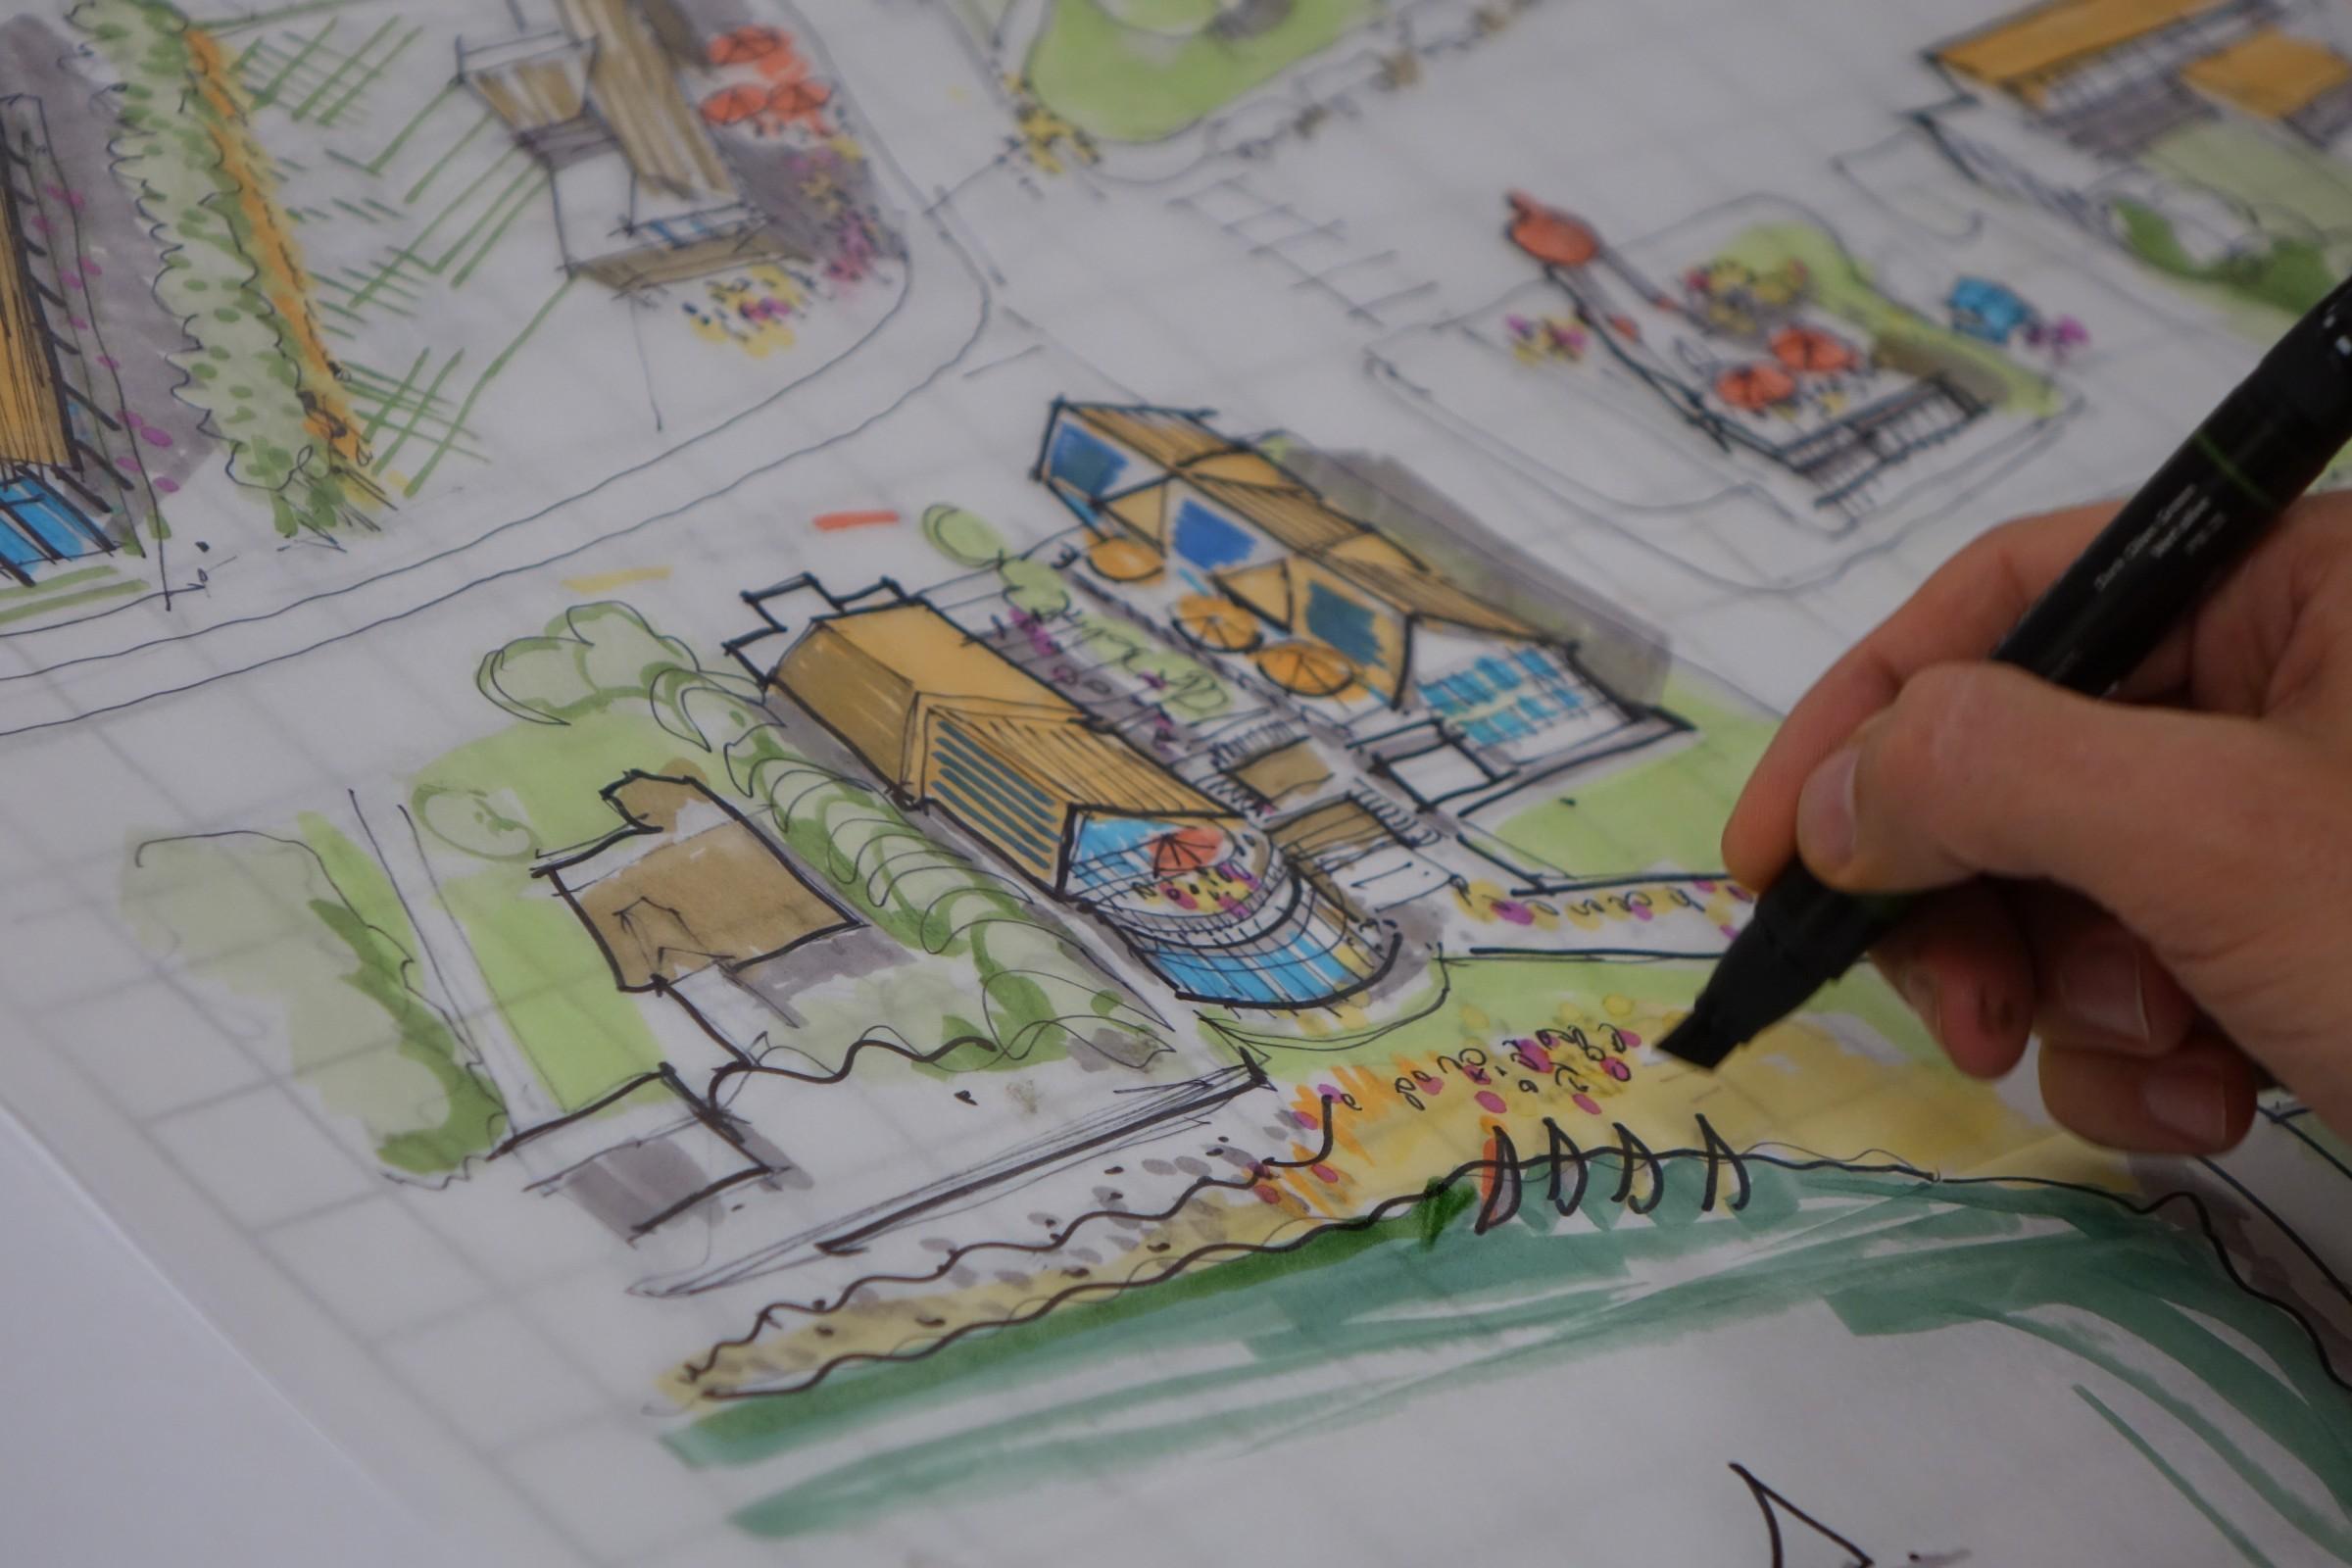 9 community placemaking community design charrette - Charrette dessin ...